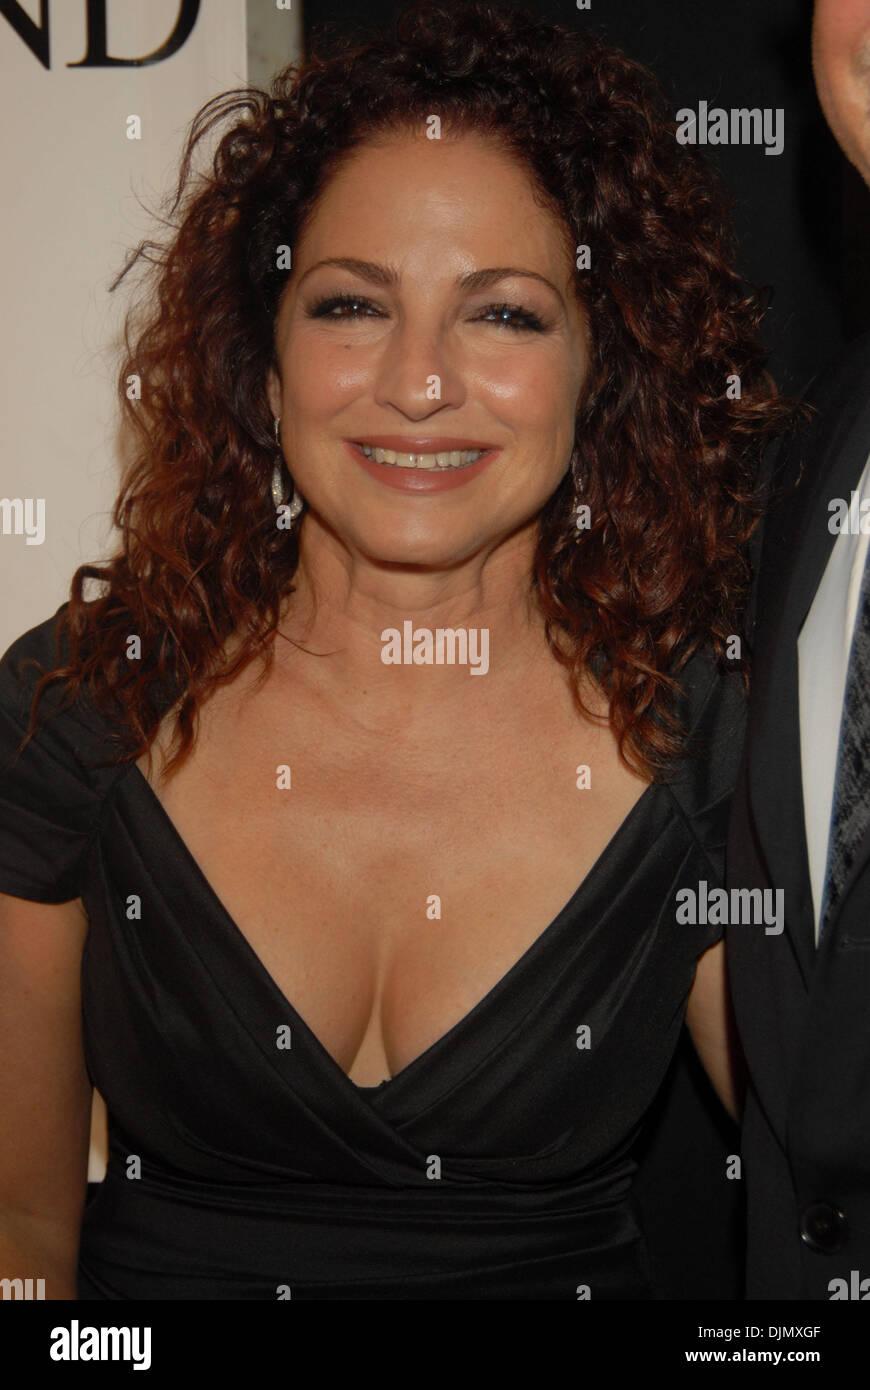 American Cuban Singer And Songwriter Stock Photos & American Cuban ...